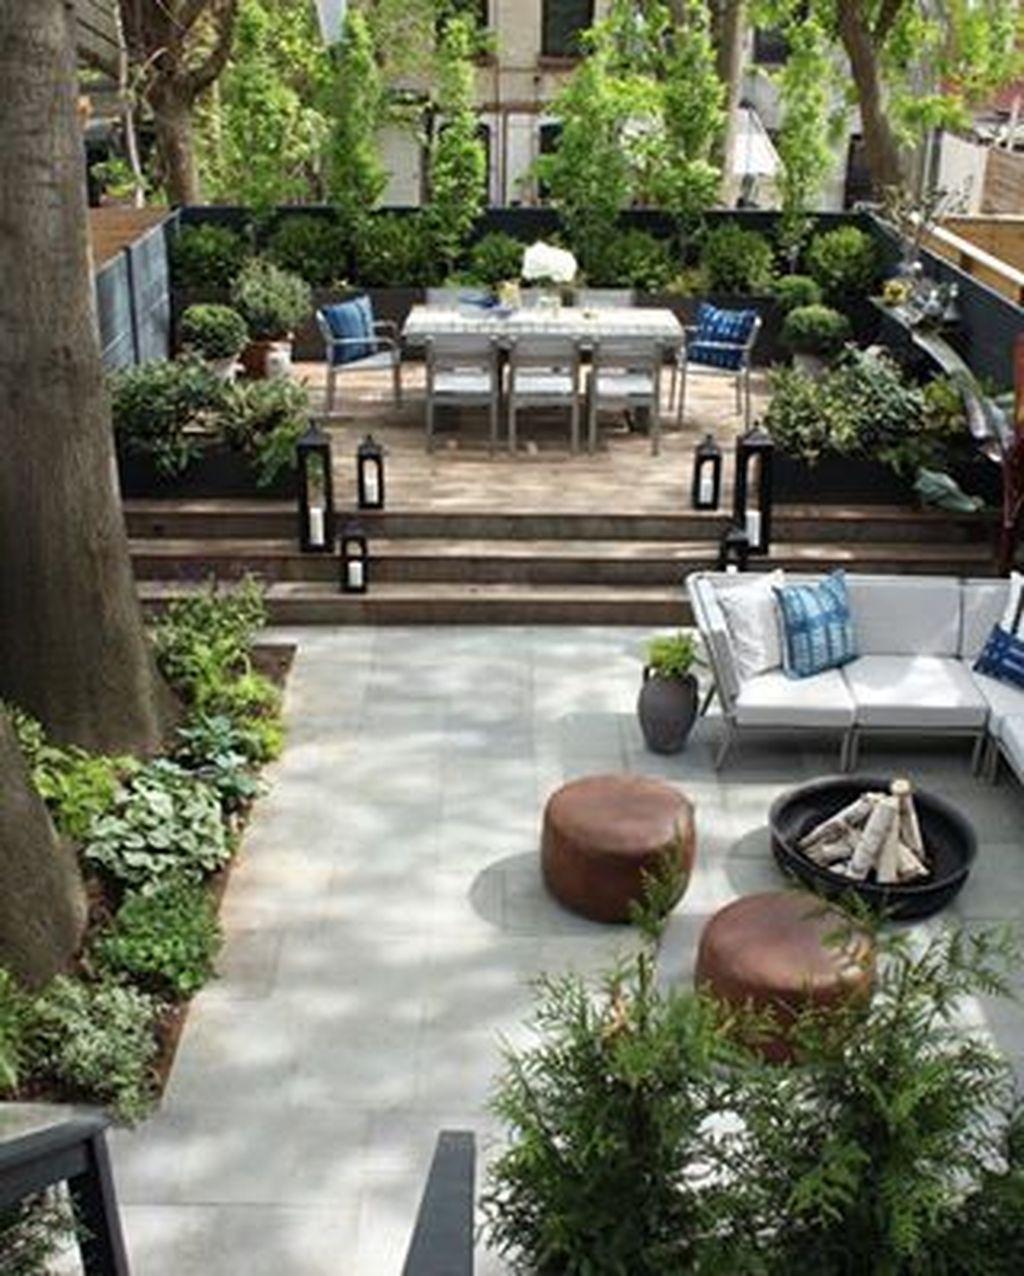 The Best Urban Garden Design Ideas For Your Backyard 16